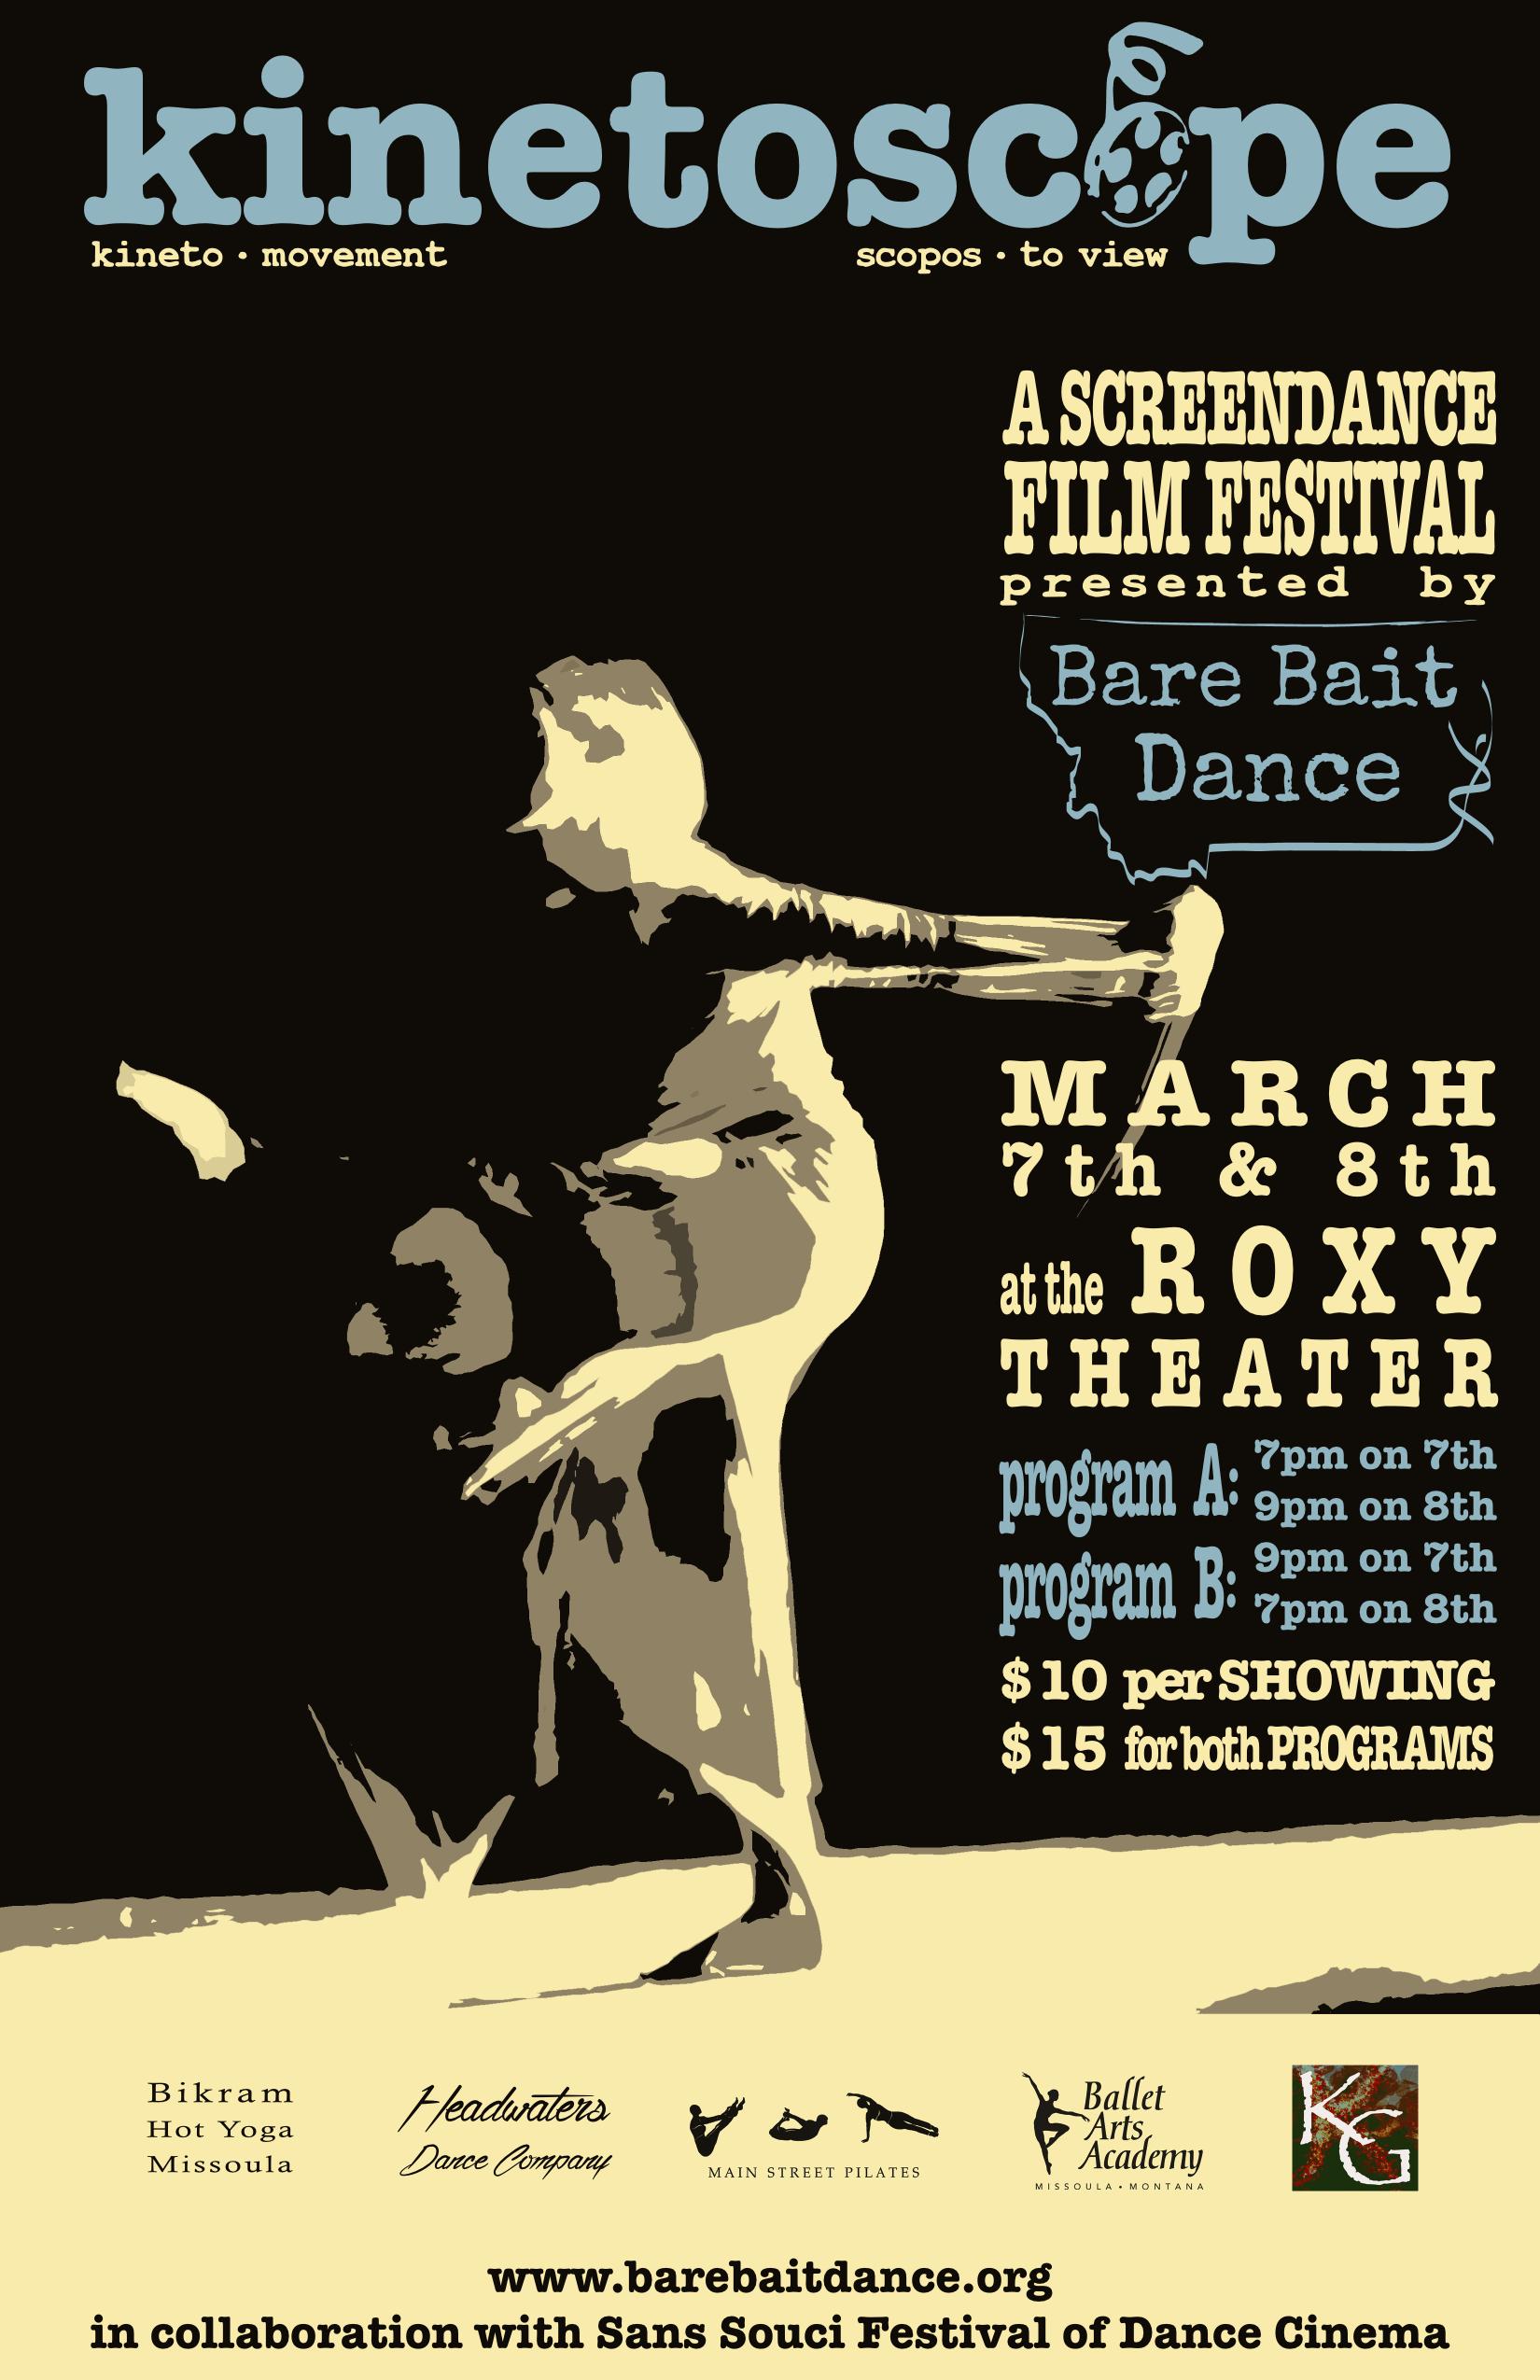 - Kinetoscope: 1 | festival poster